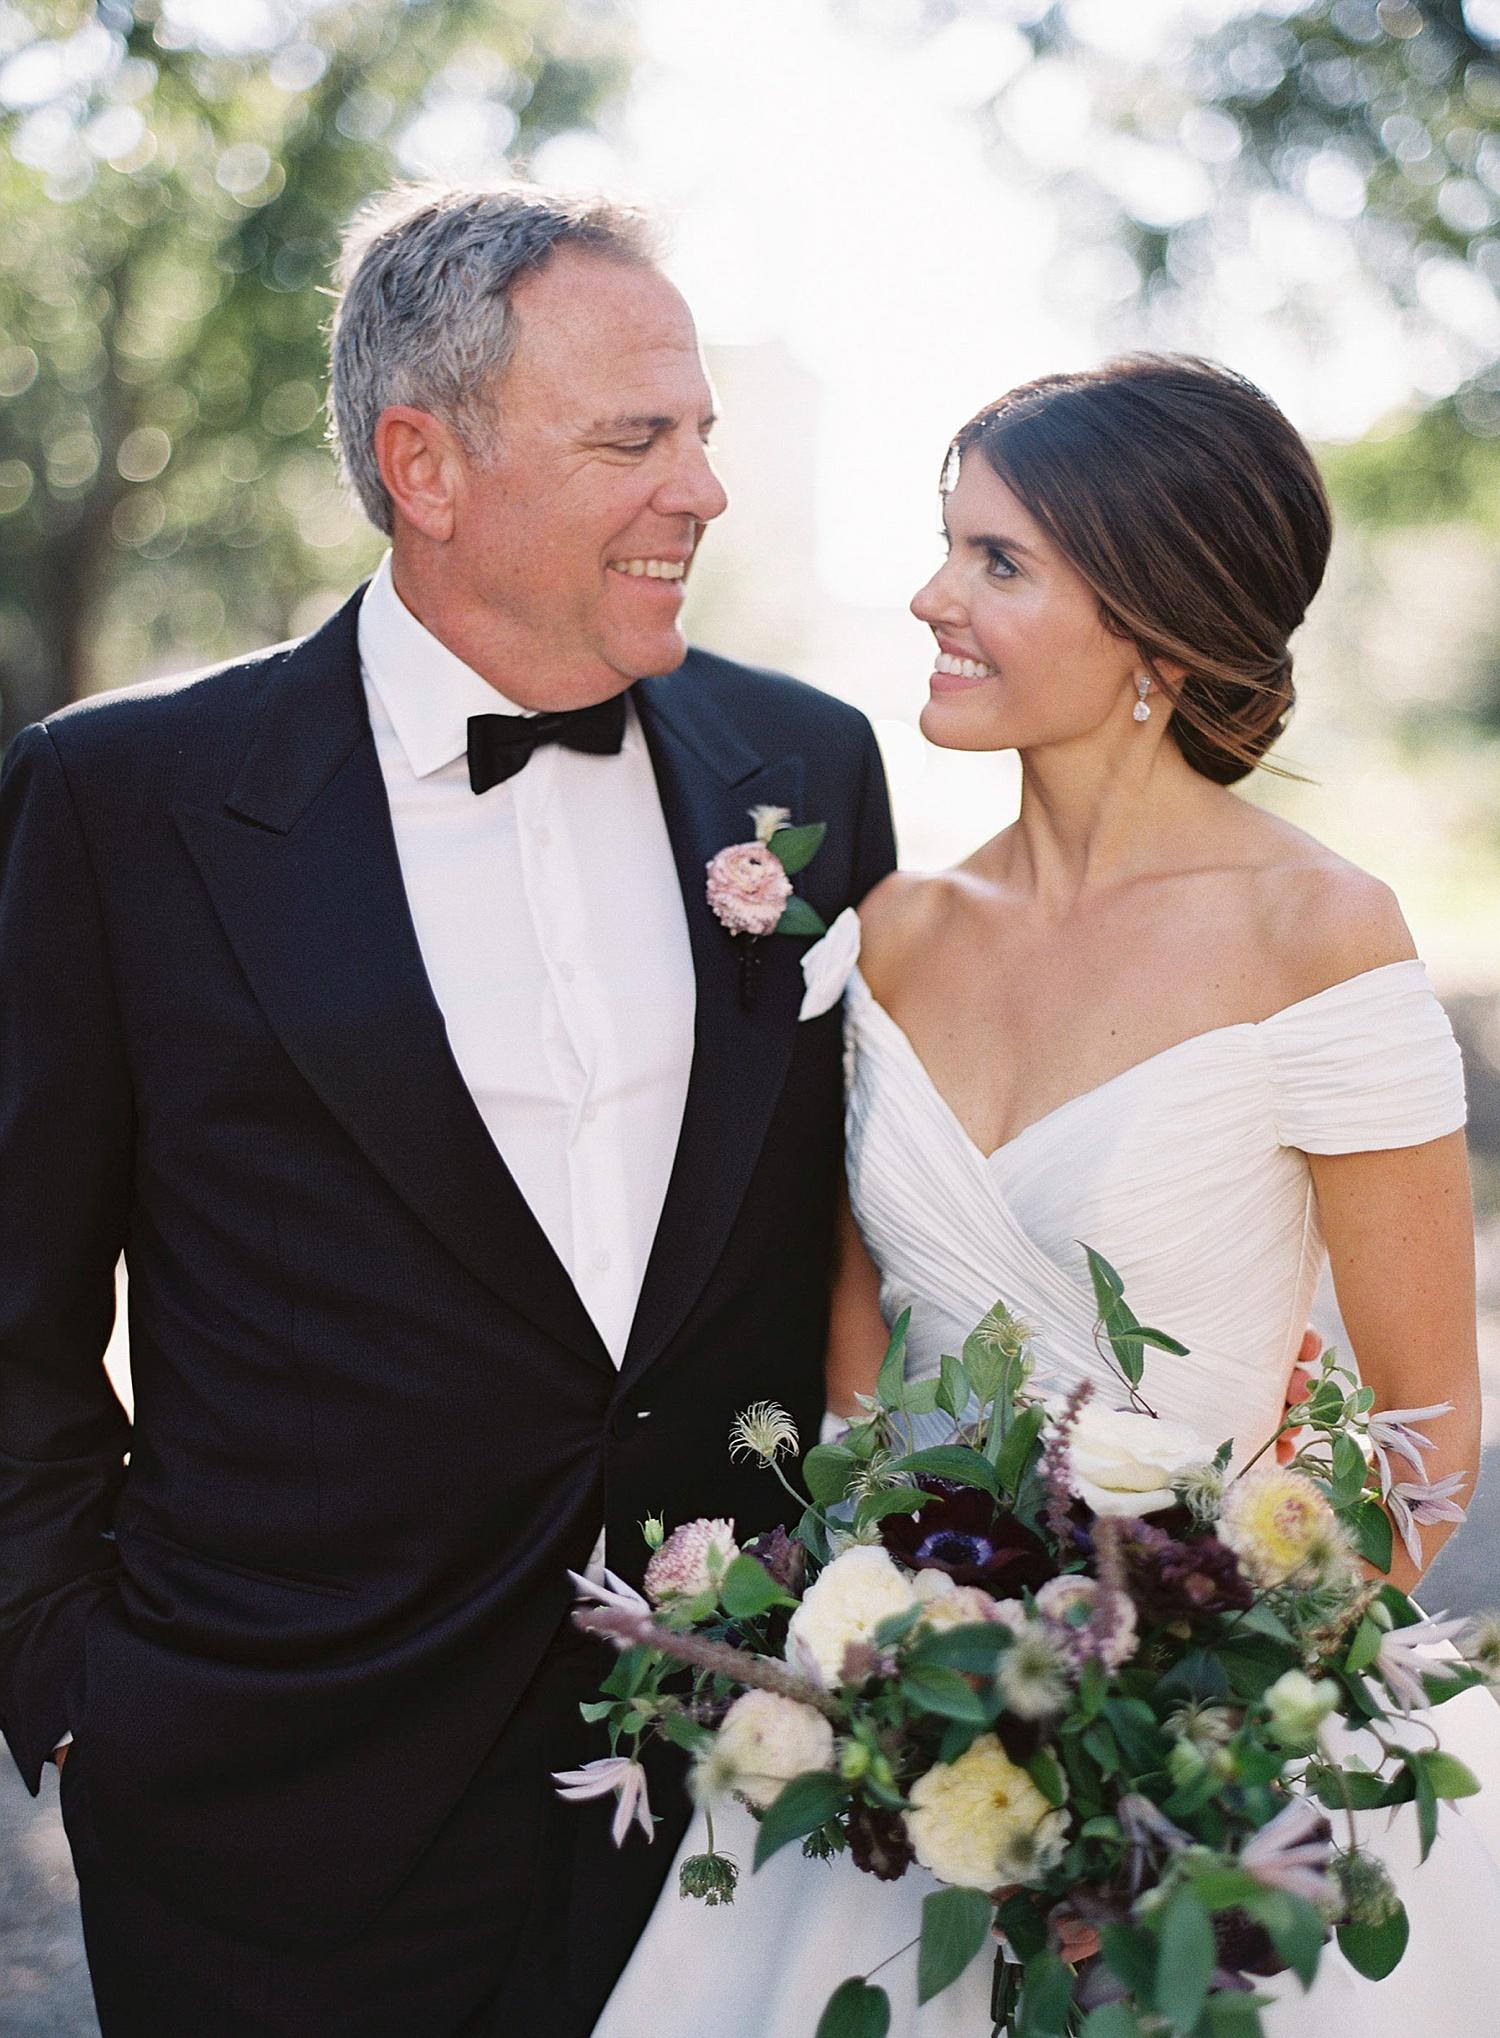 12_dewberry_charleston_wedding.jpg